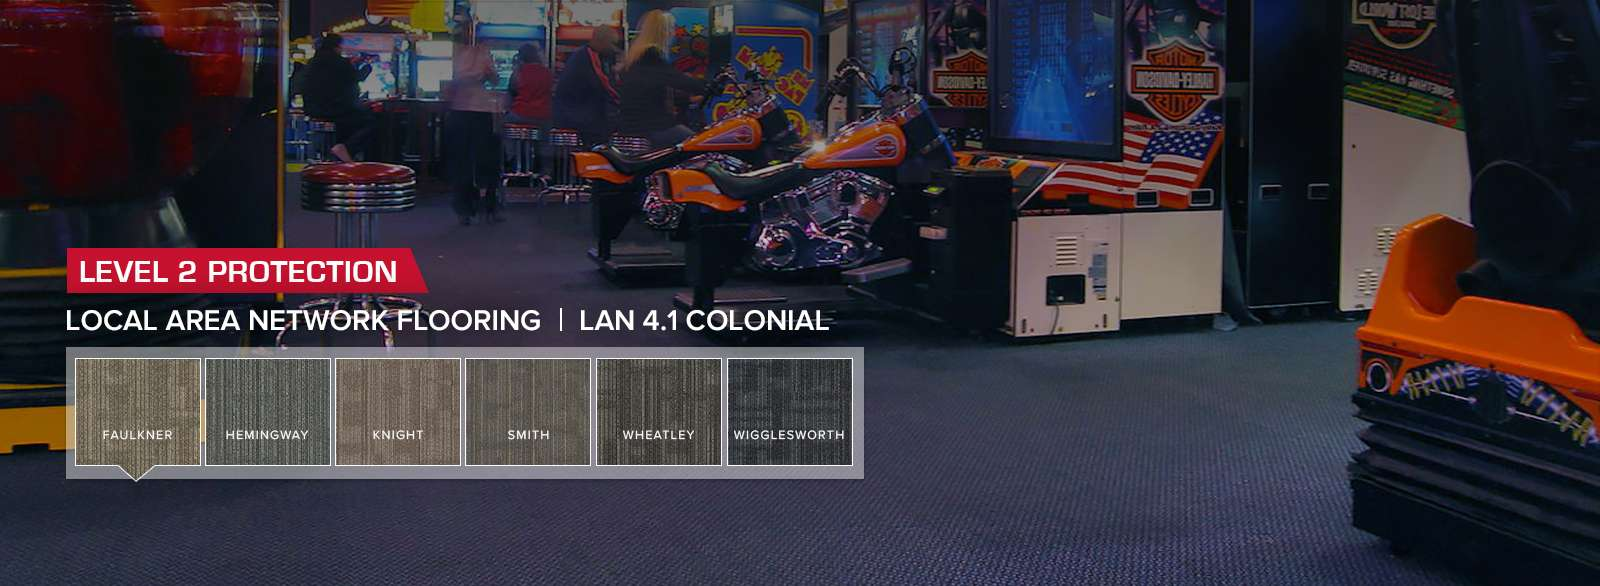 StaticSmart's LAN 4.1 Static Dissipative Flooring